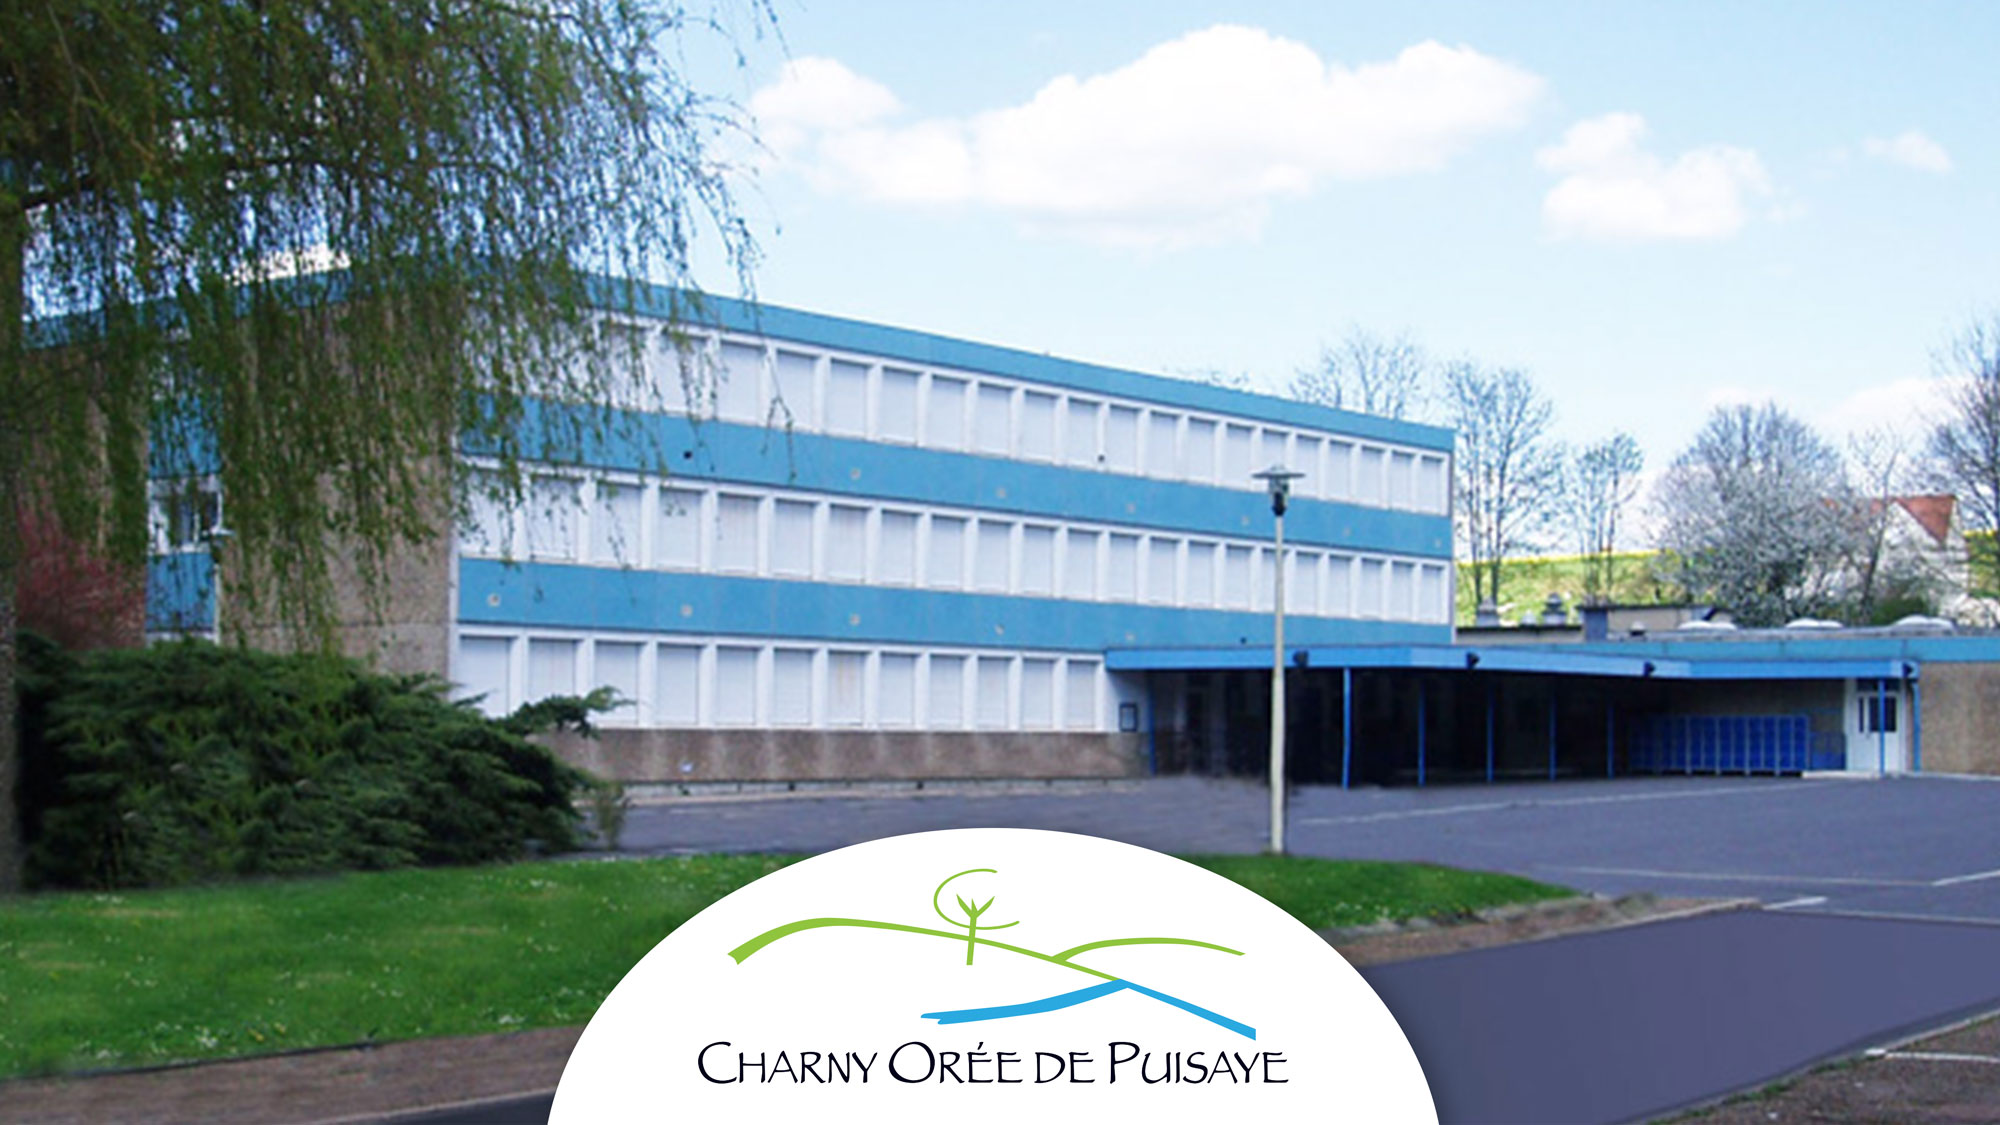 Collège Michel Gondry Charny Orée de Puisaye